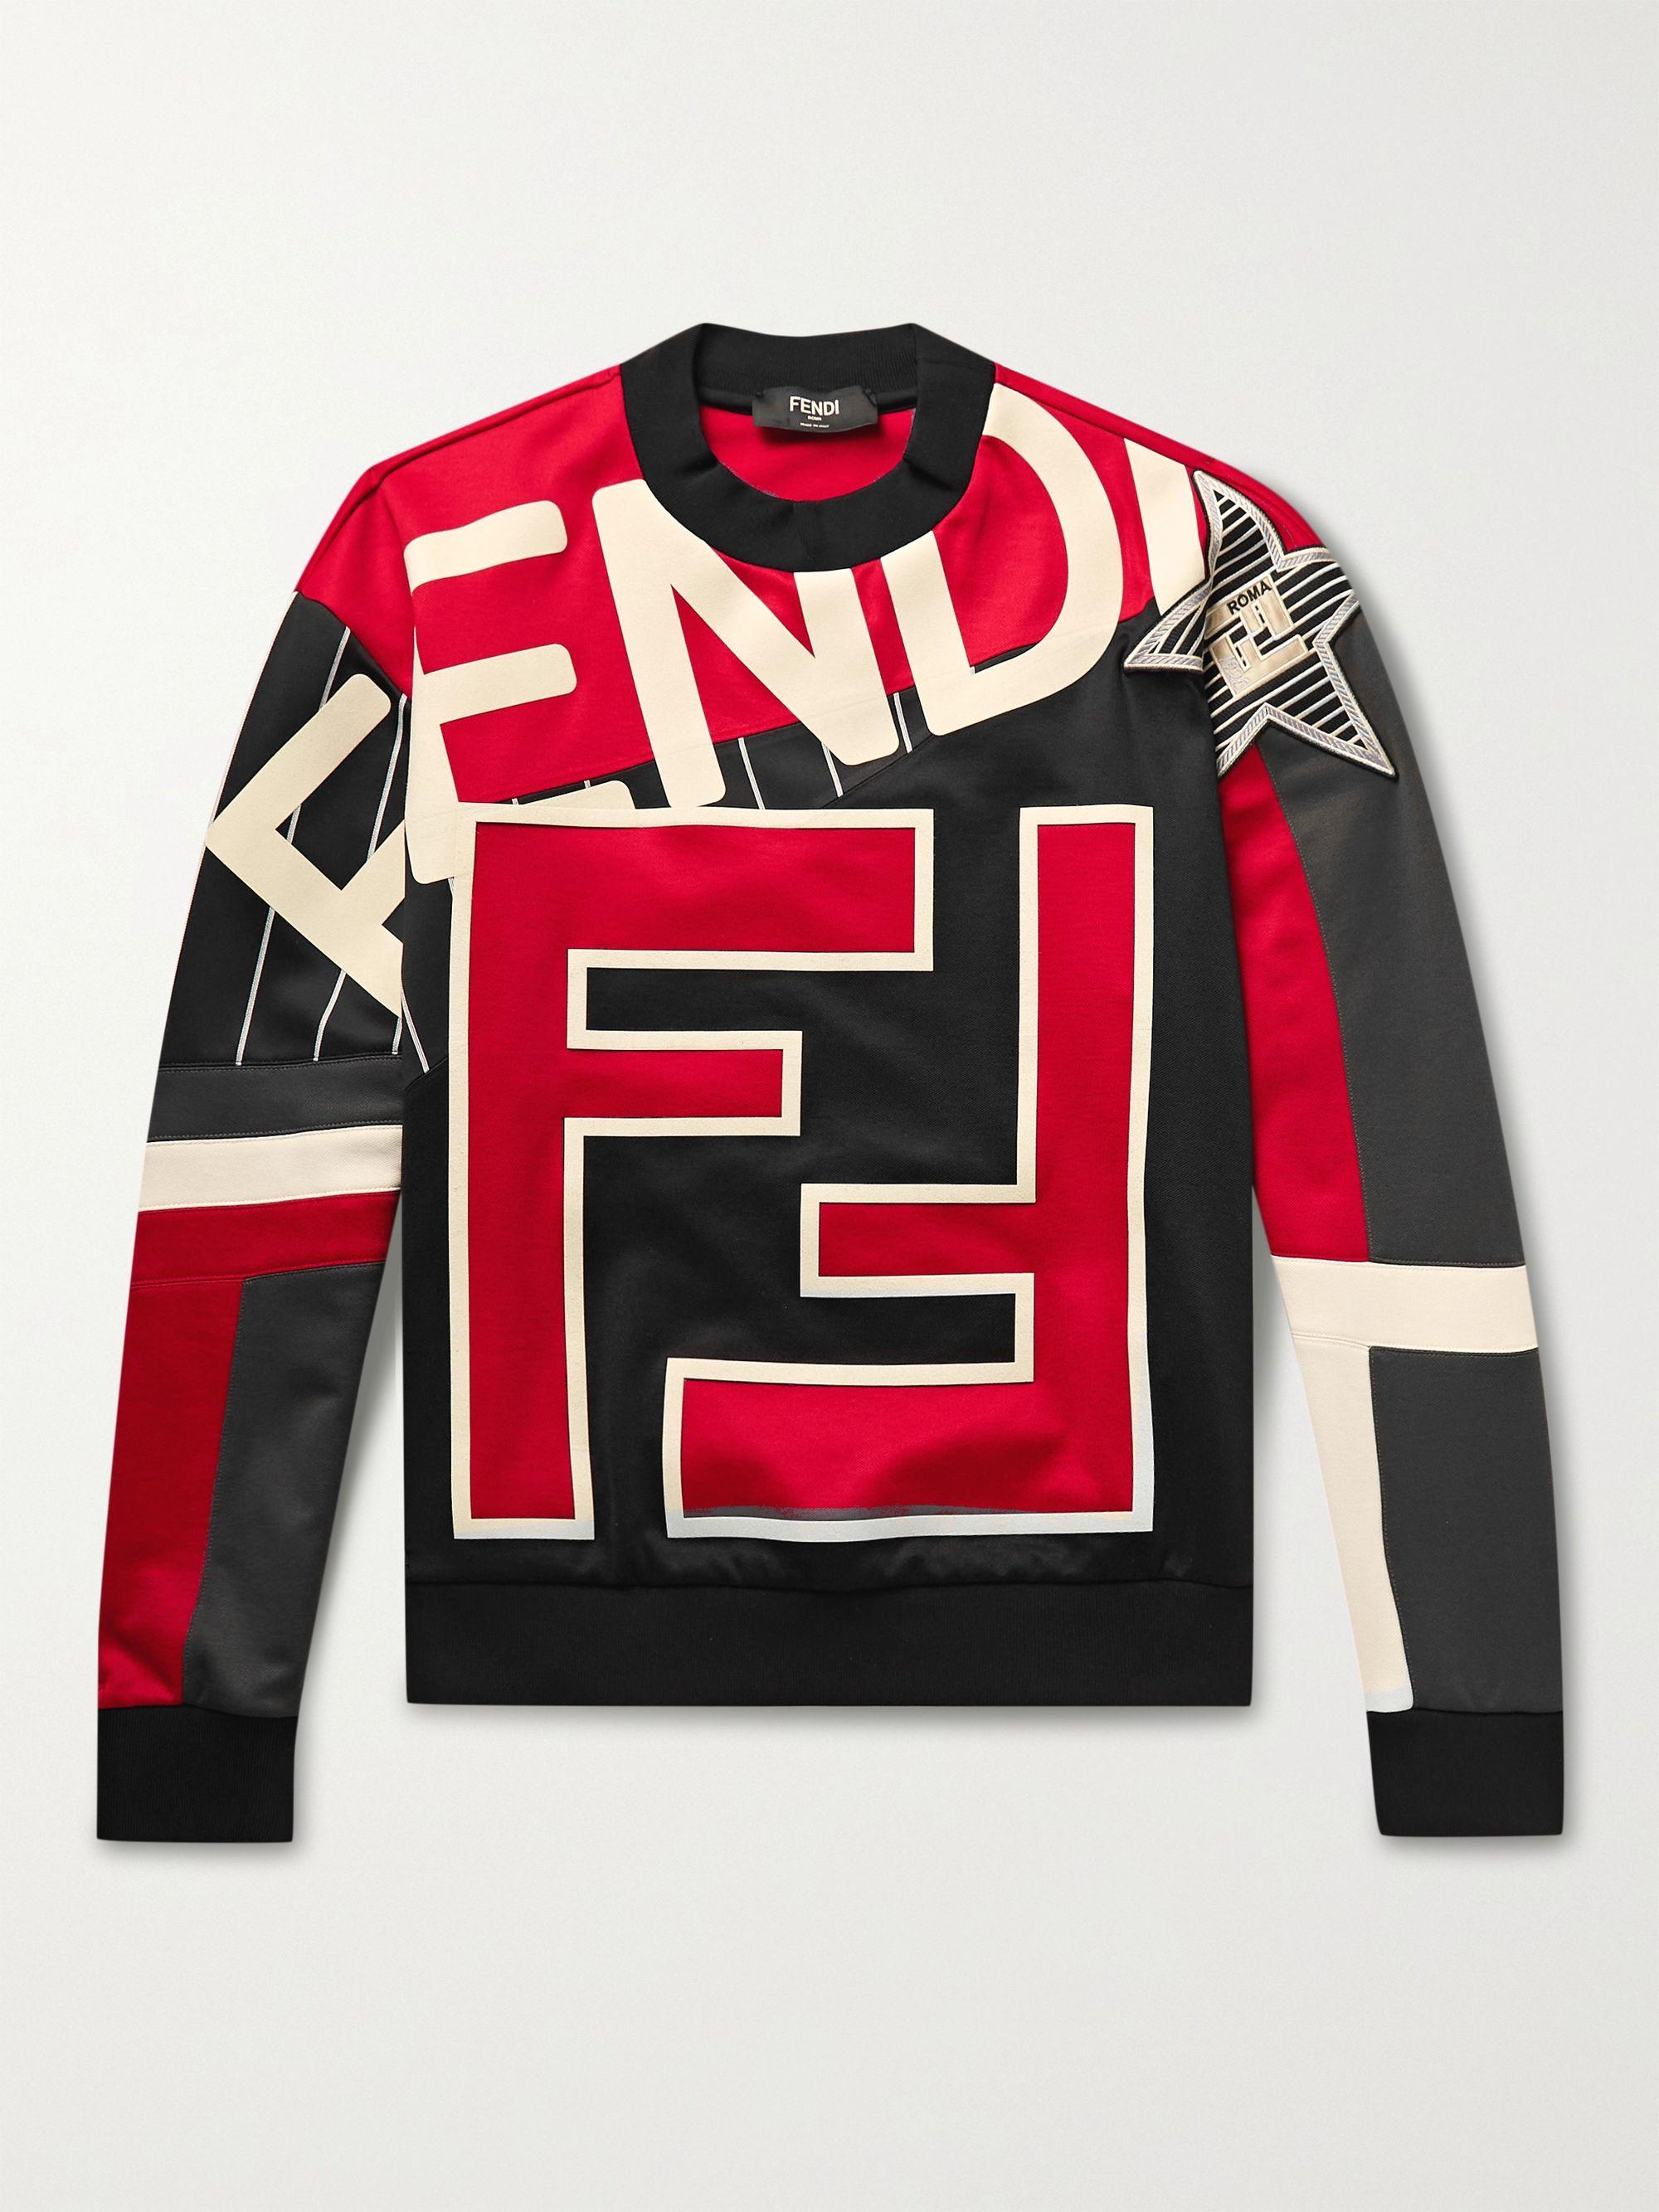 FENDI Appliqued Jersey Sweatshirt